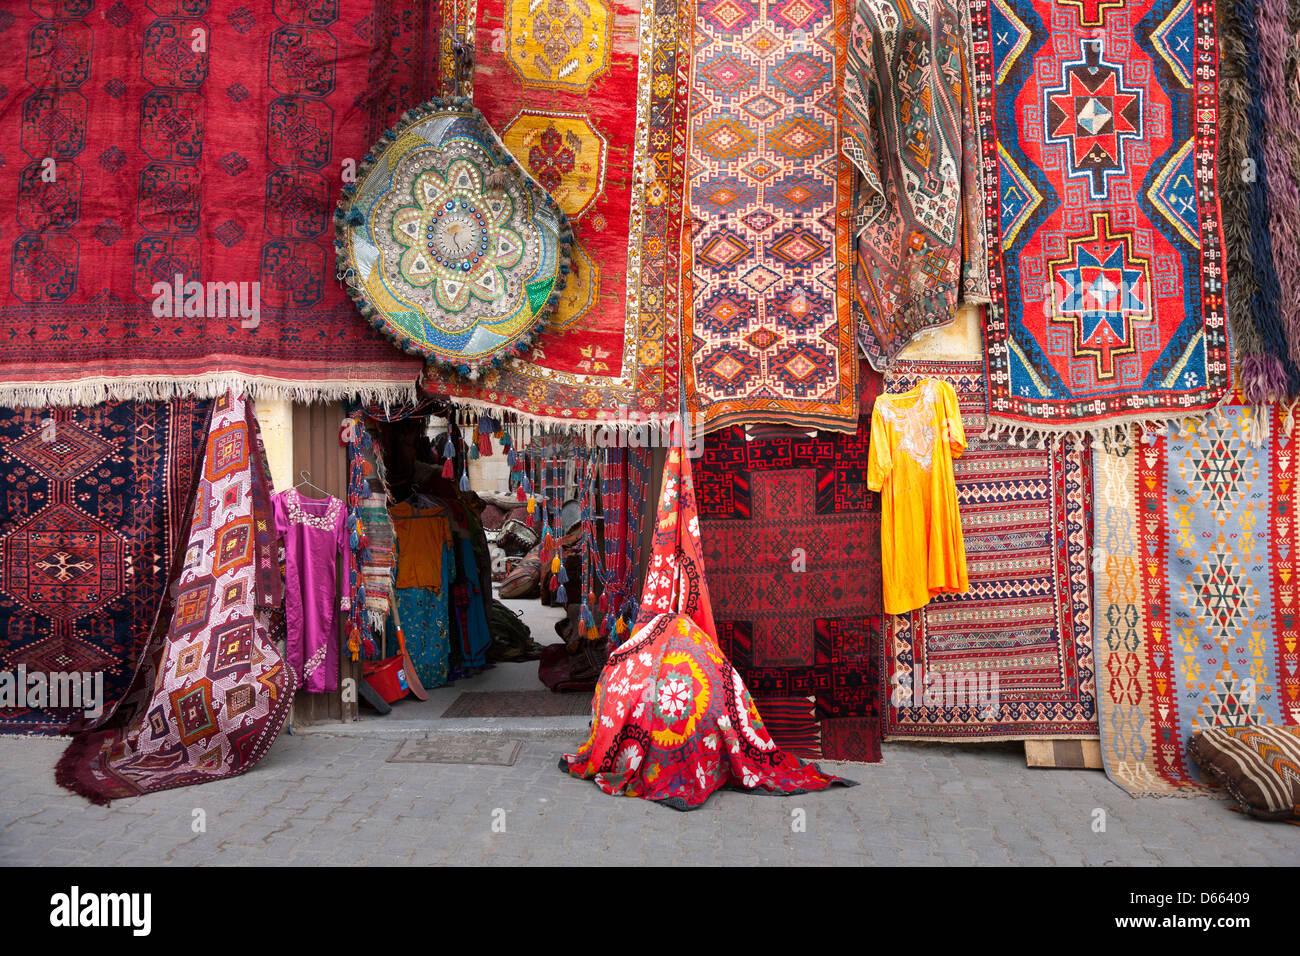 Turkish Carpet Shop In Goreme Turkey